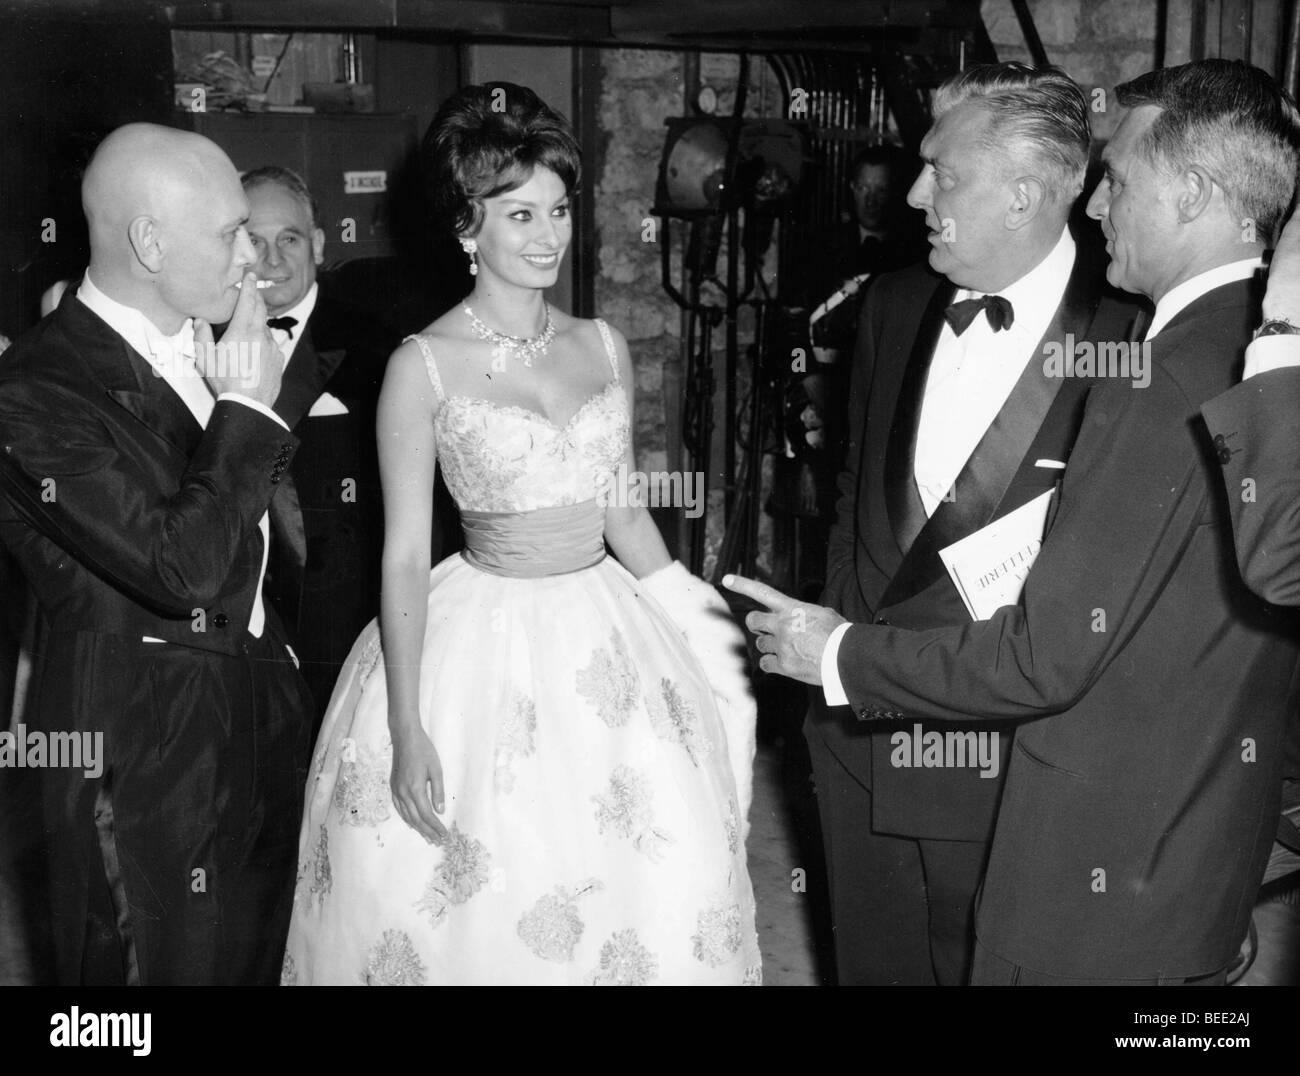 Sophia Loren Yul Brynner Cary Grant And Jacques Tati At